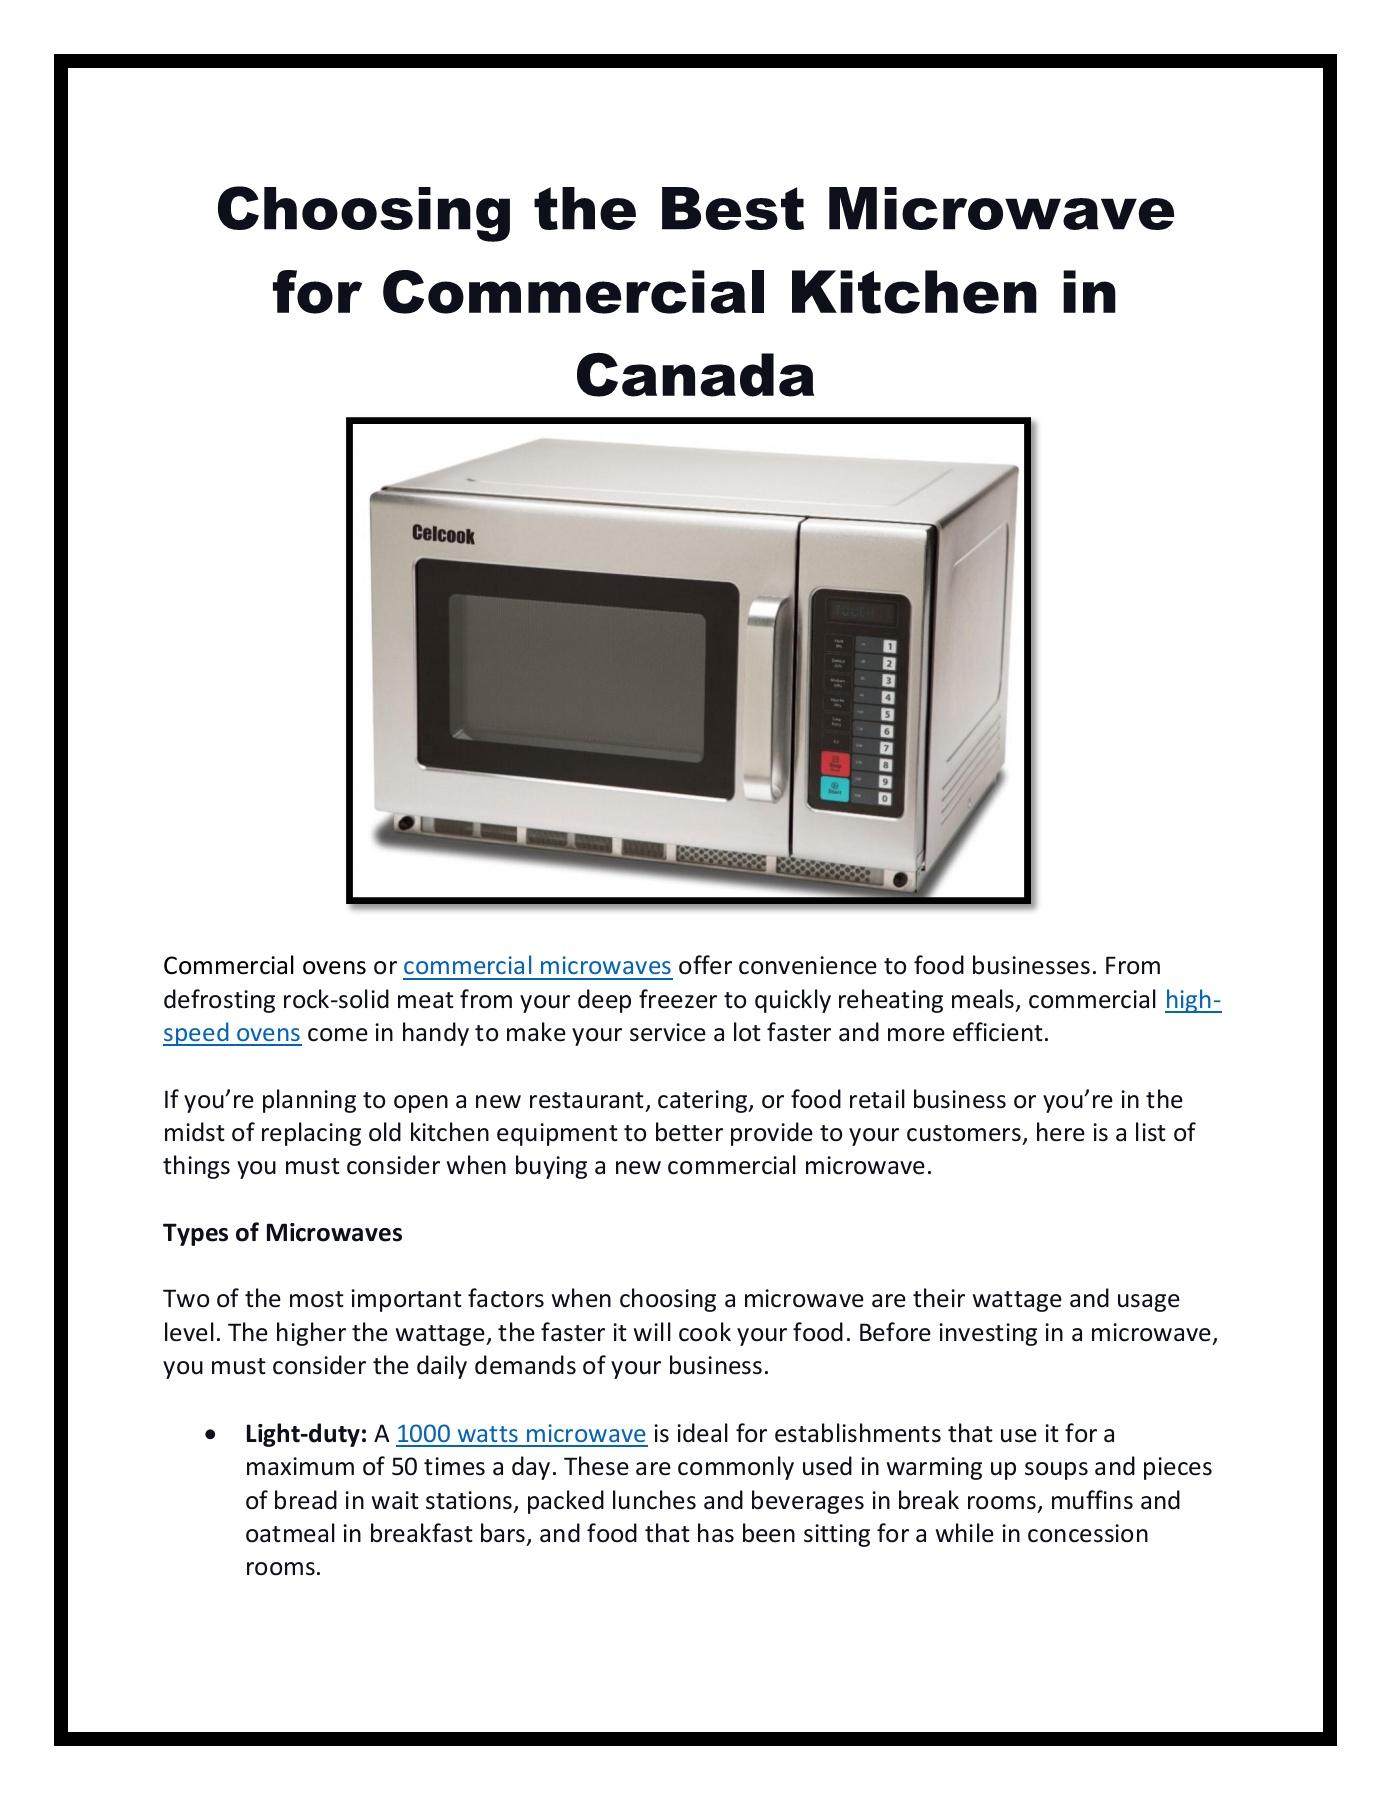 buy a professional microwave flip ebook